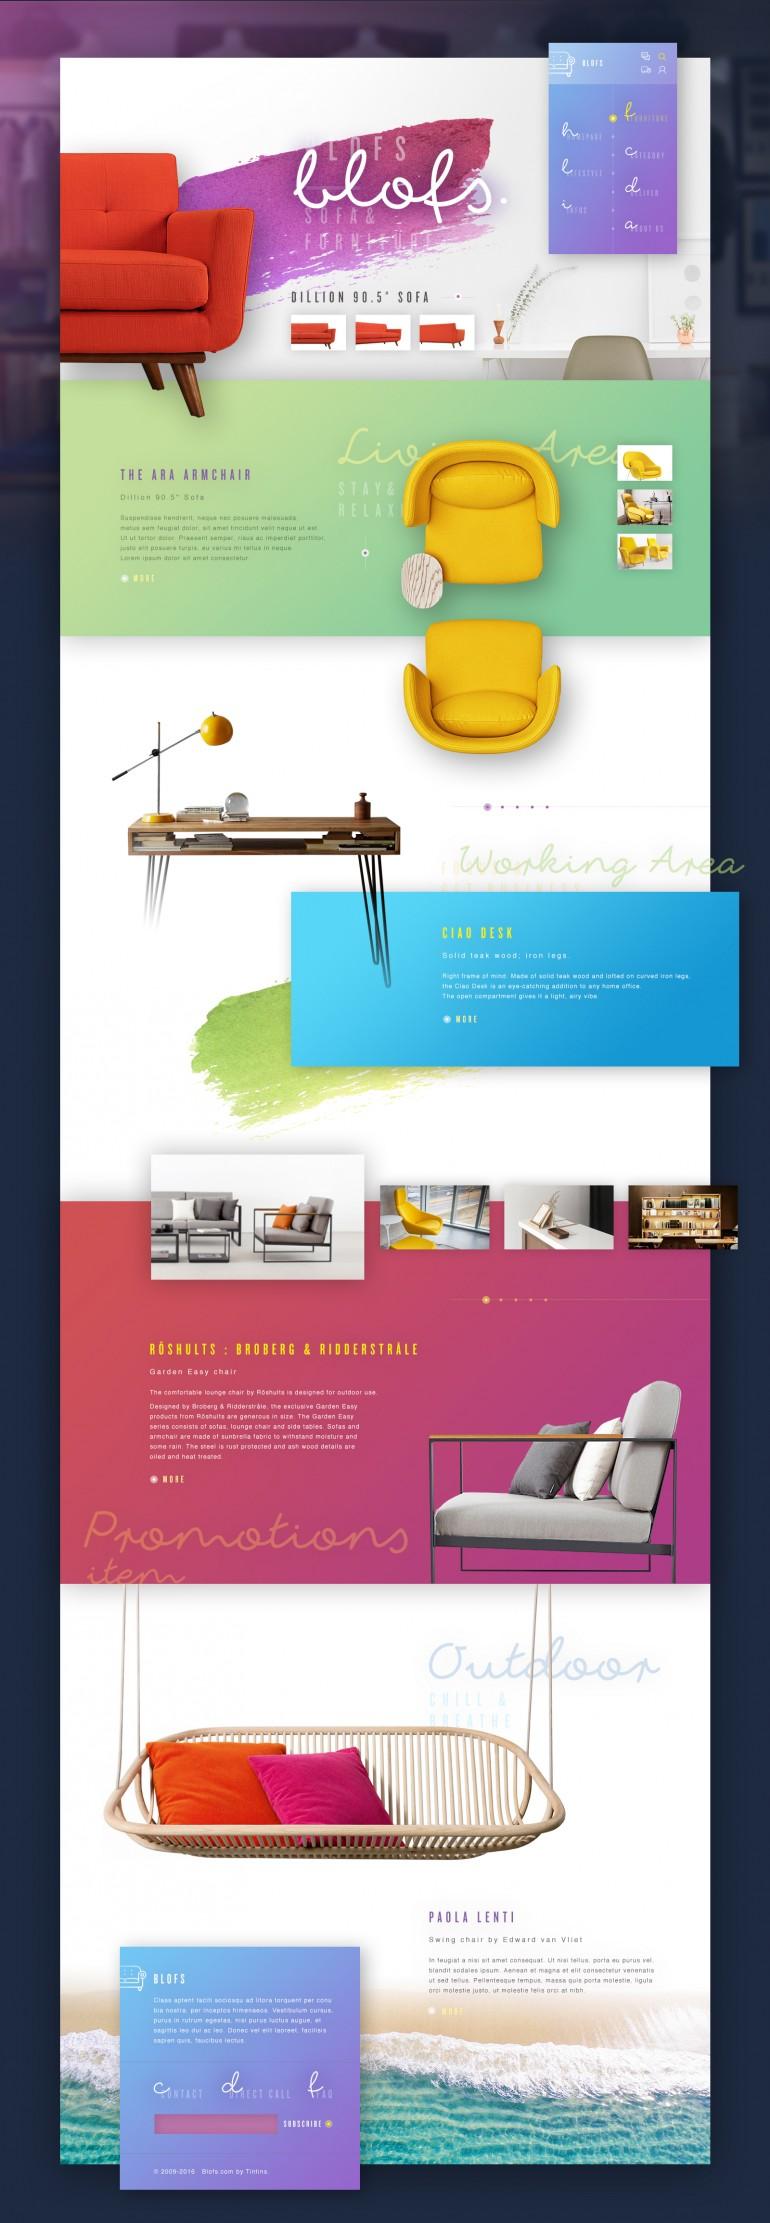 Blofs : Colorful decor